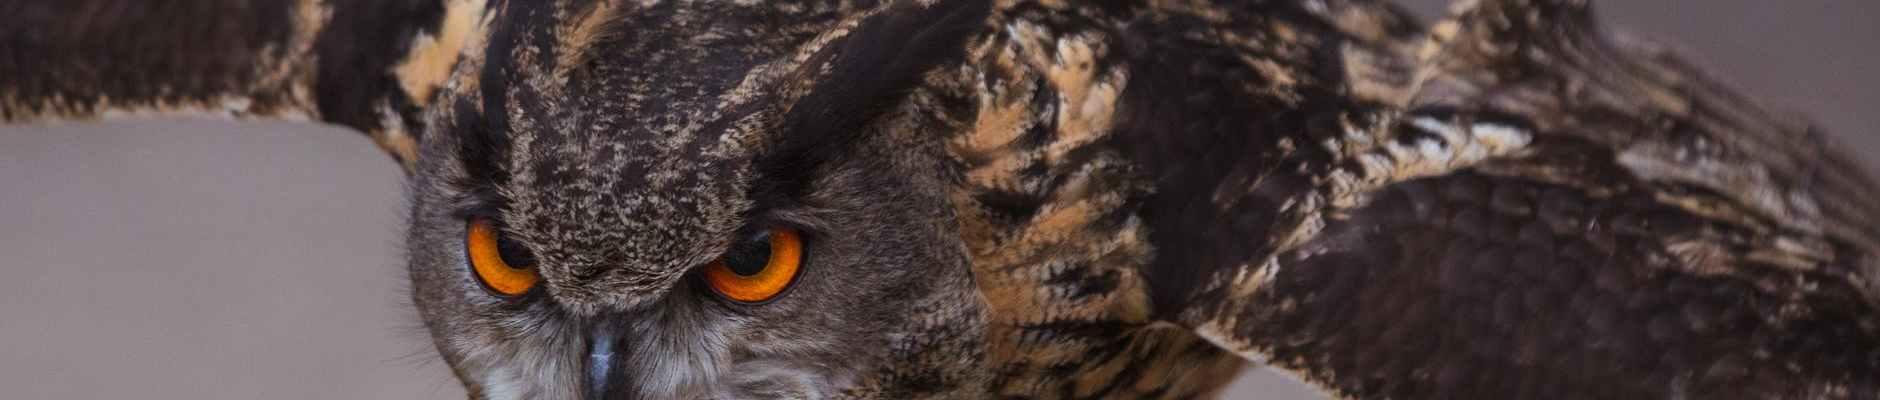 close up shot it an owl